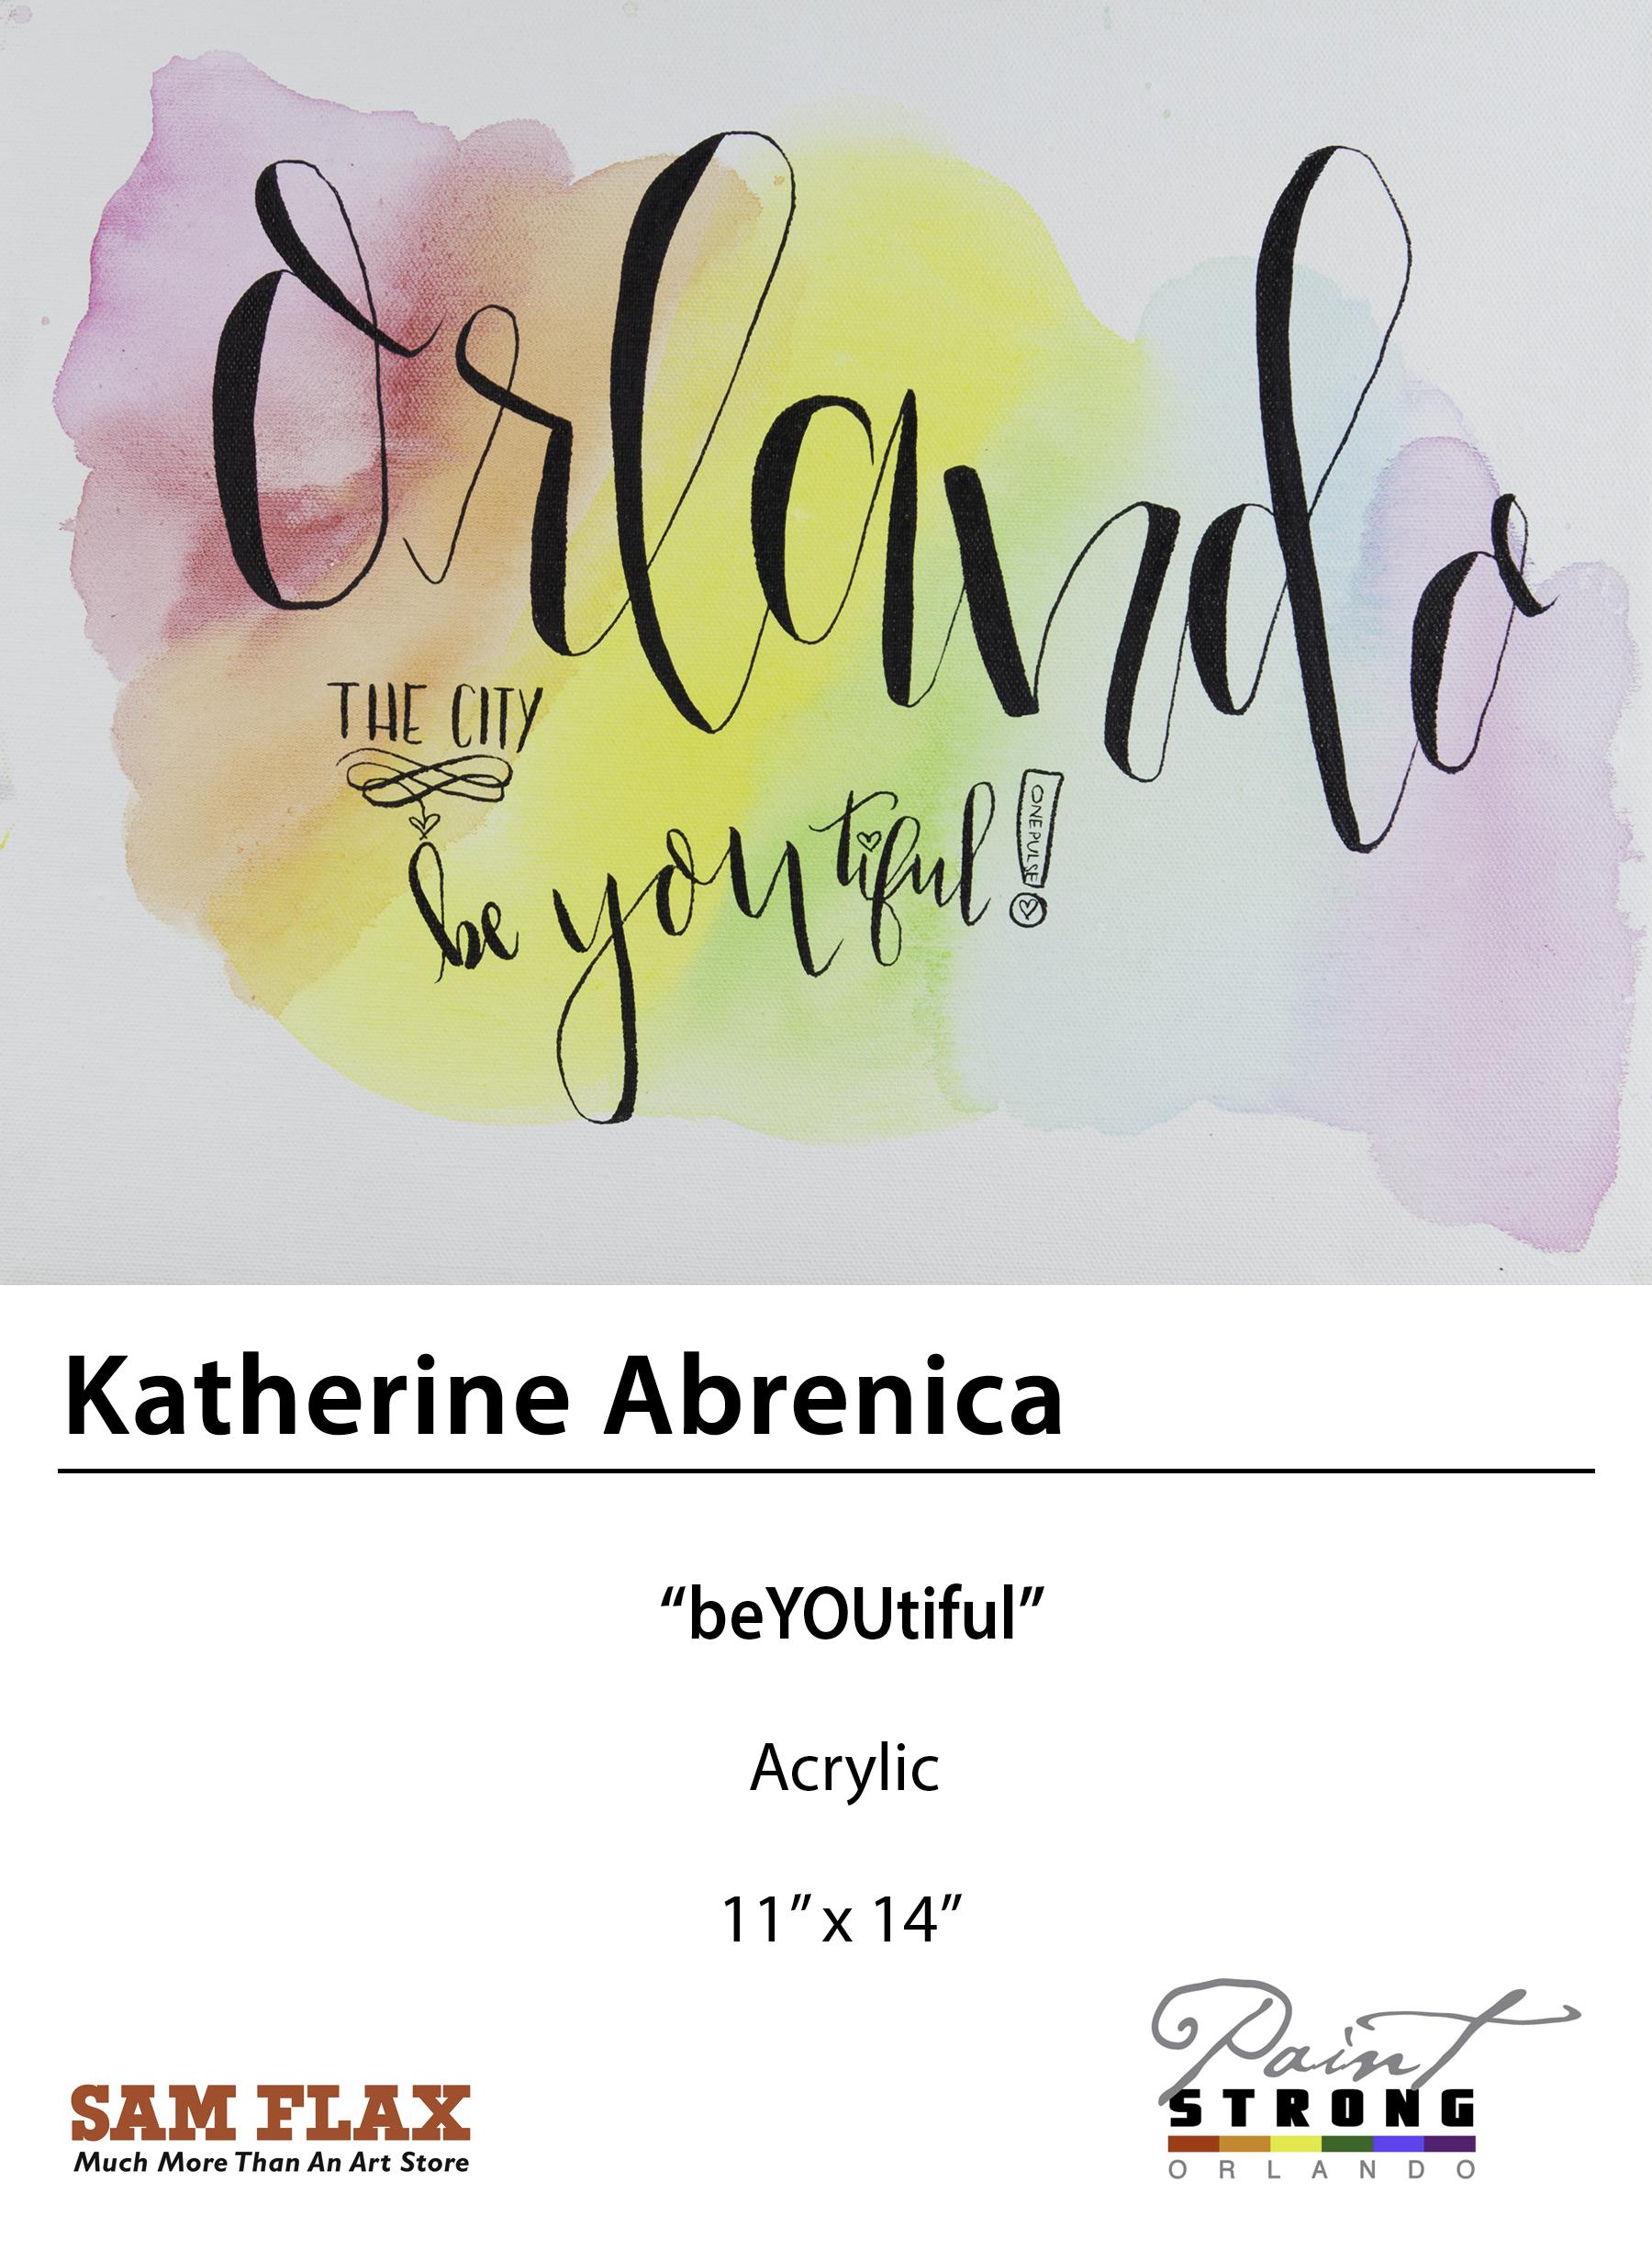 Katherine Abrenica